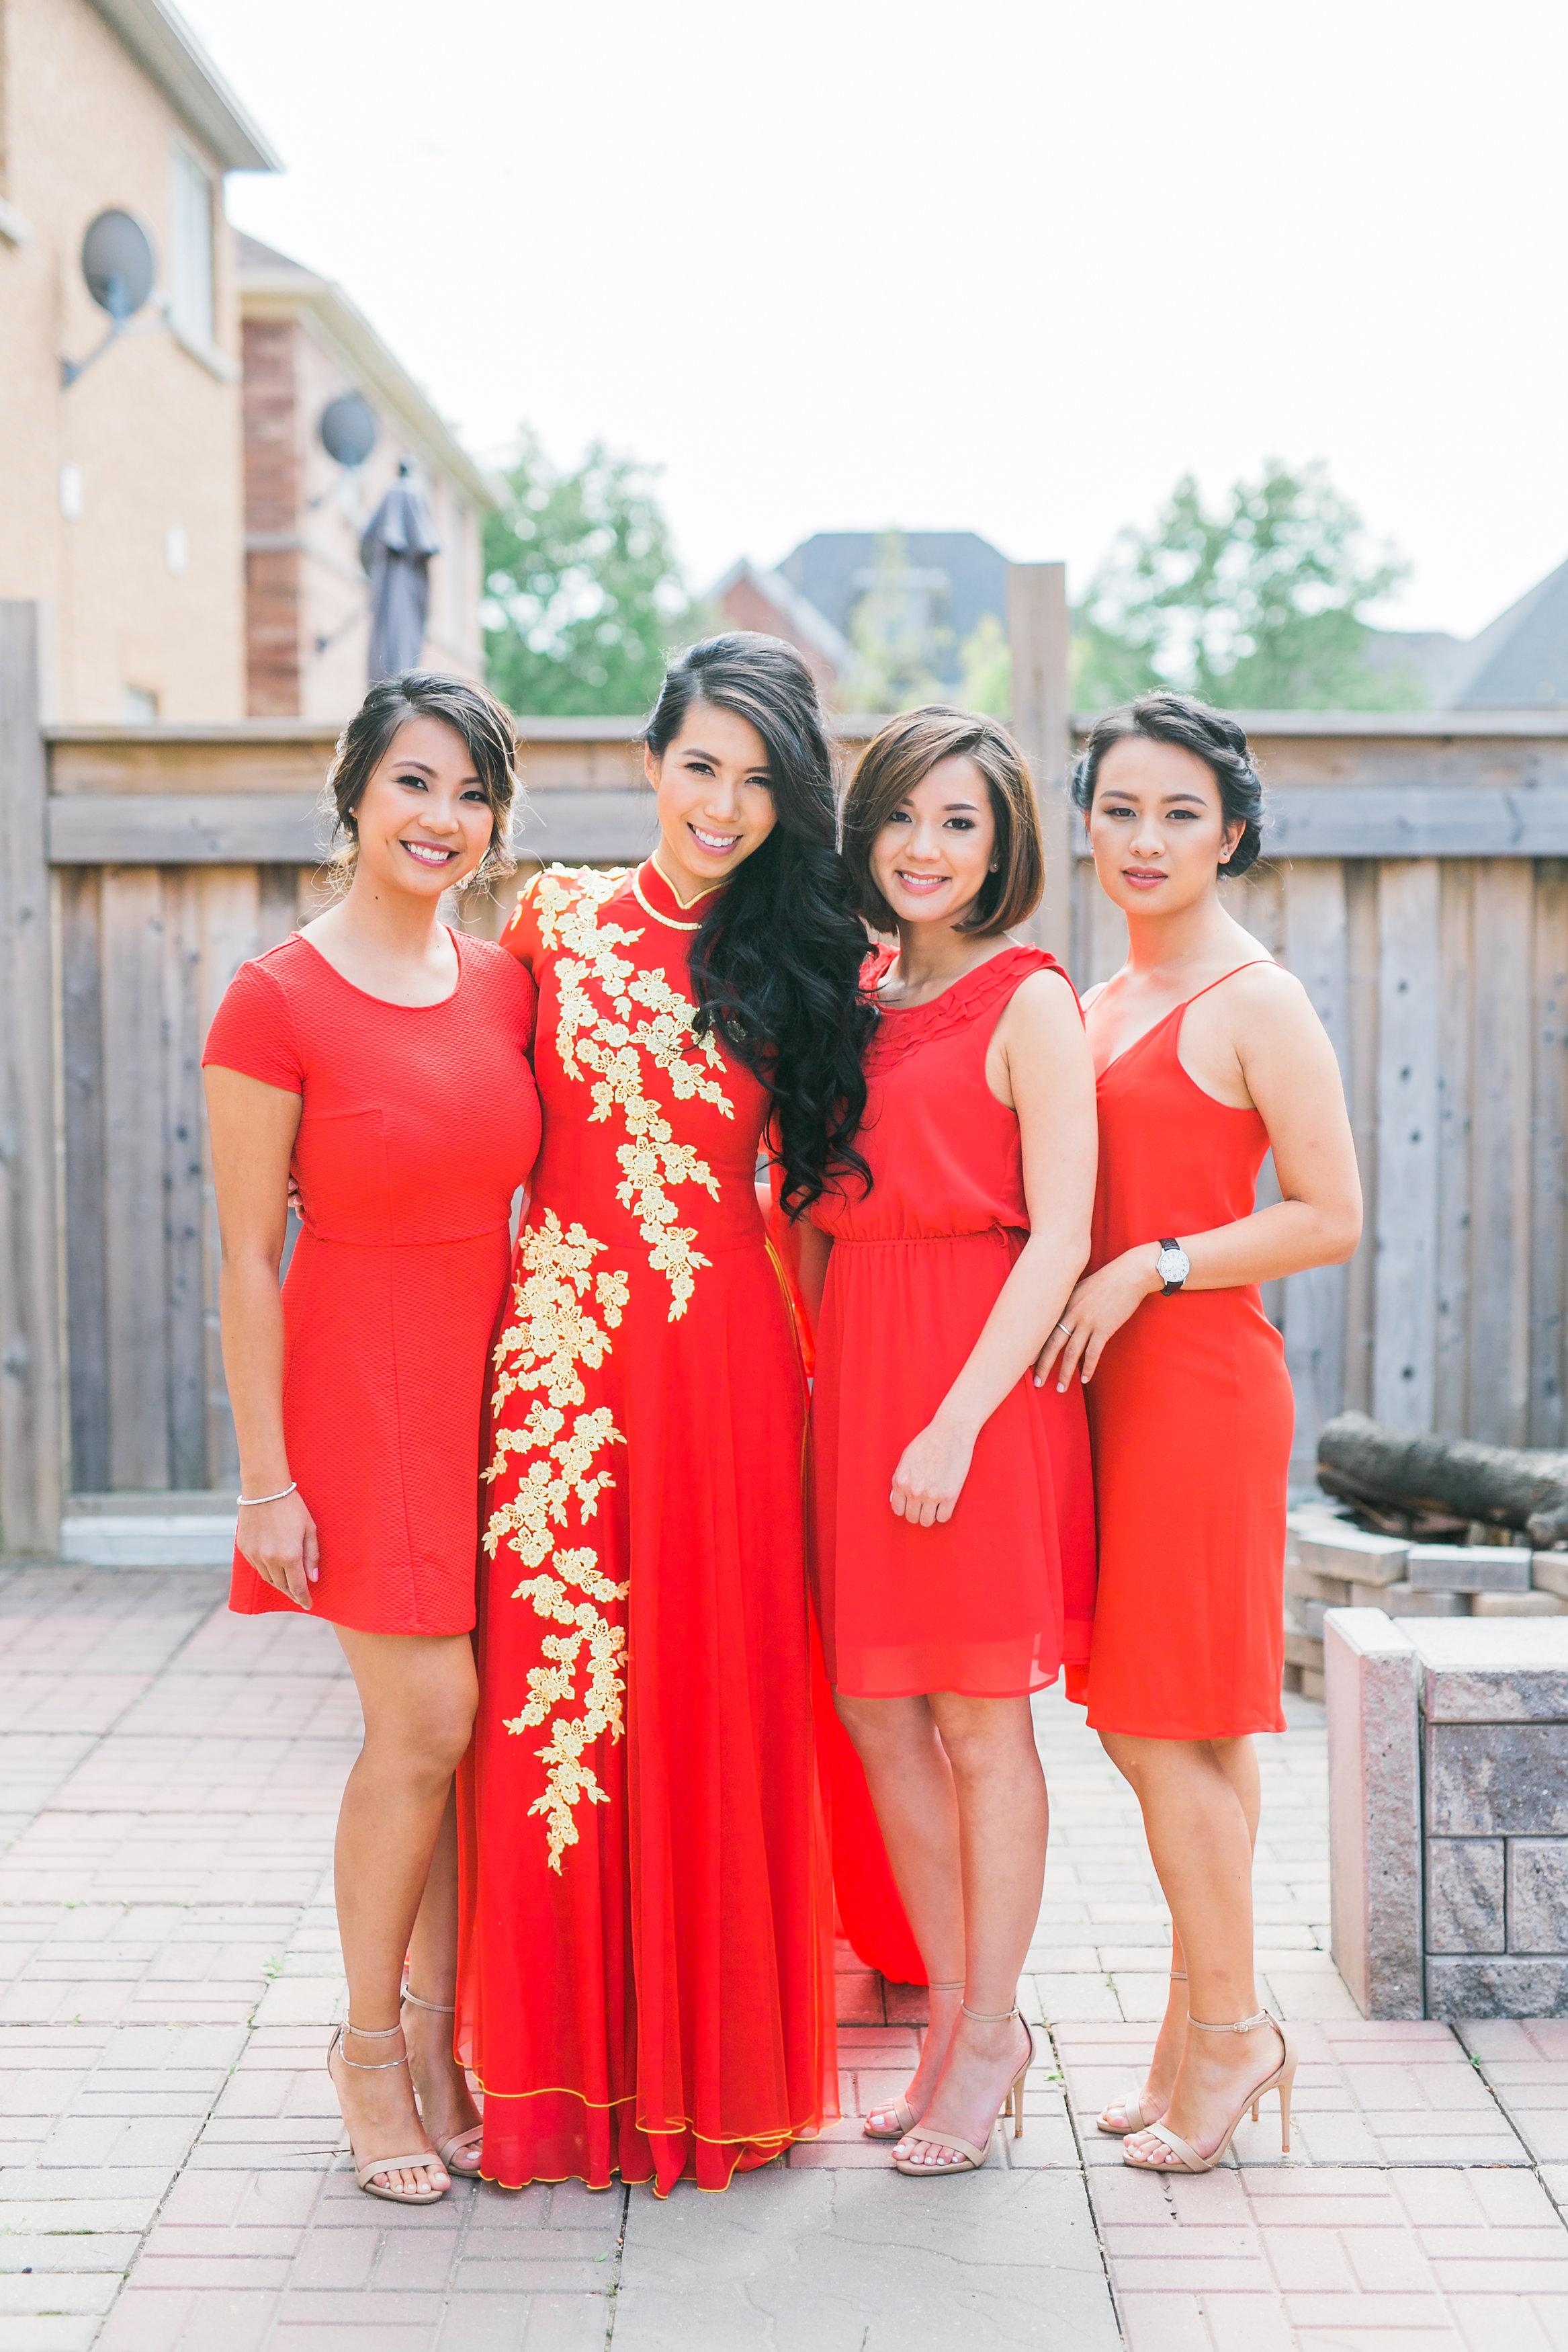 Phoebe Lo Events Toronto Wedding - Graydon Hall Manor Garden Charm Event 009.jpg